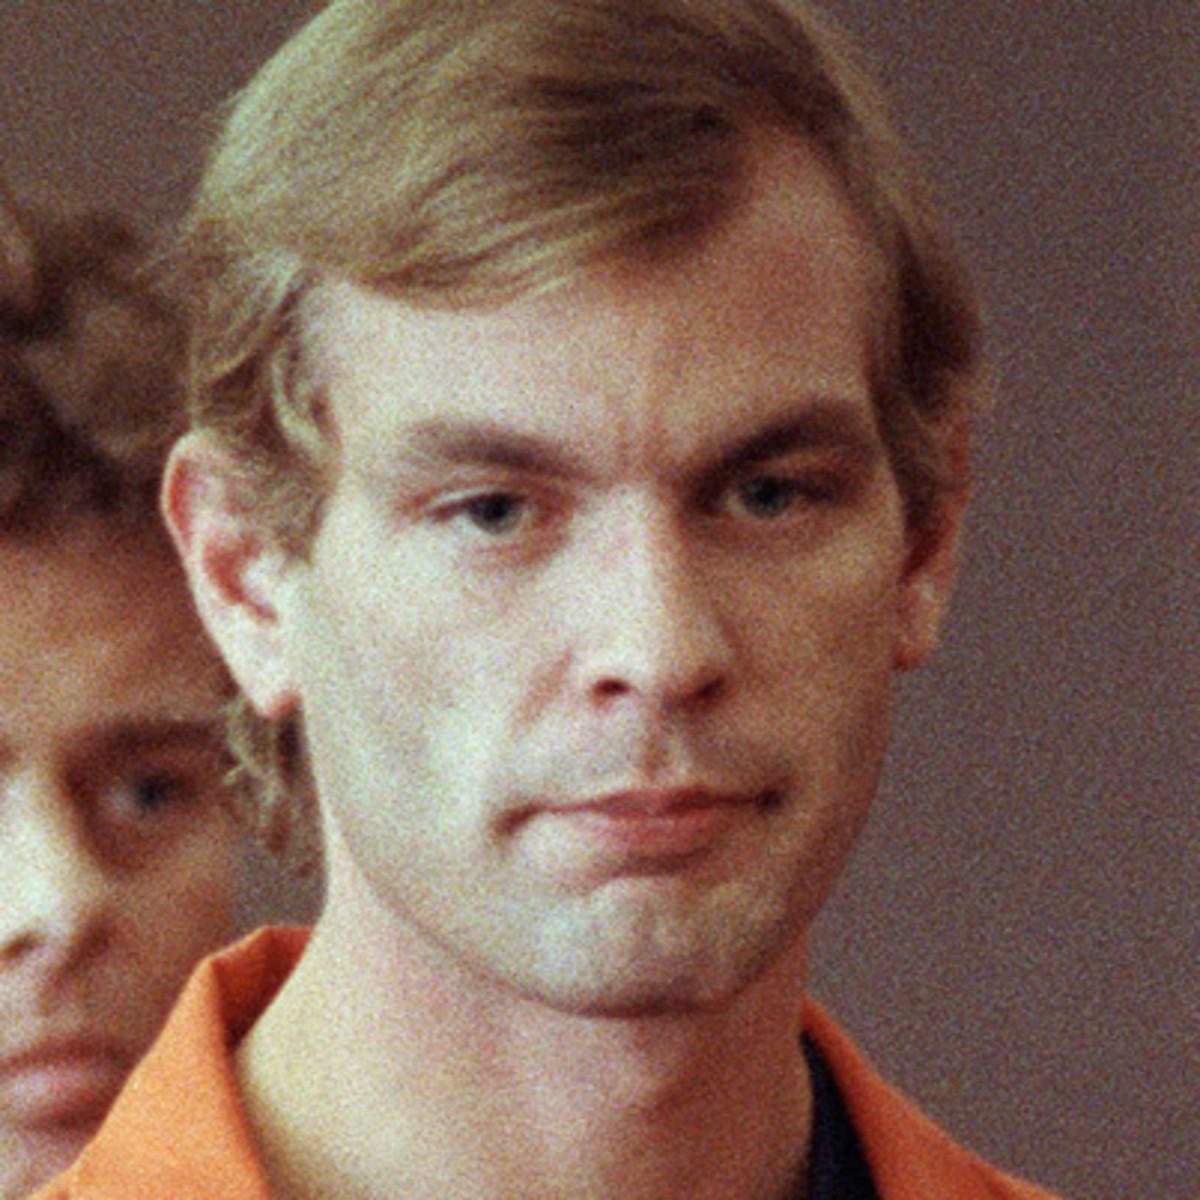 Huyền Thoại Kẻ Sát Nhân Ăn Thịt Người Vùng Milwaukee Jeffrey Dahmer (hay The Milwaukee Man-Eater, The Milwaukee Ruhr Cannibal)